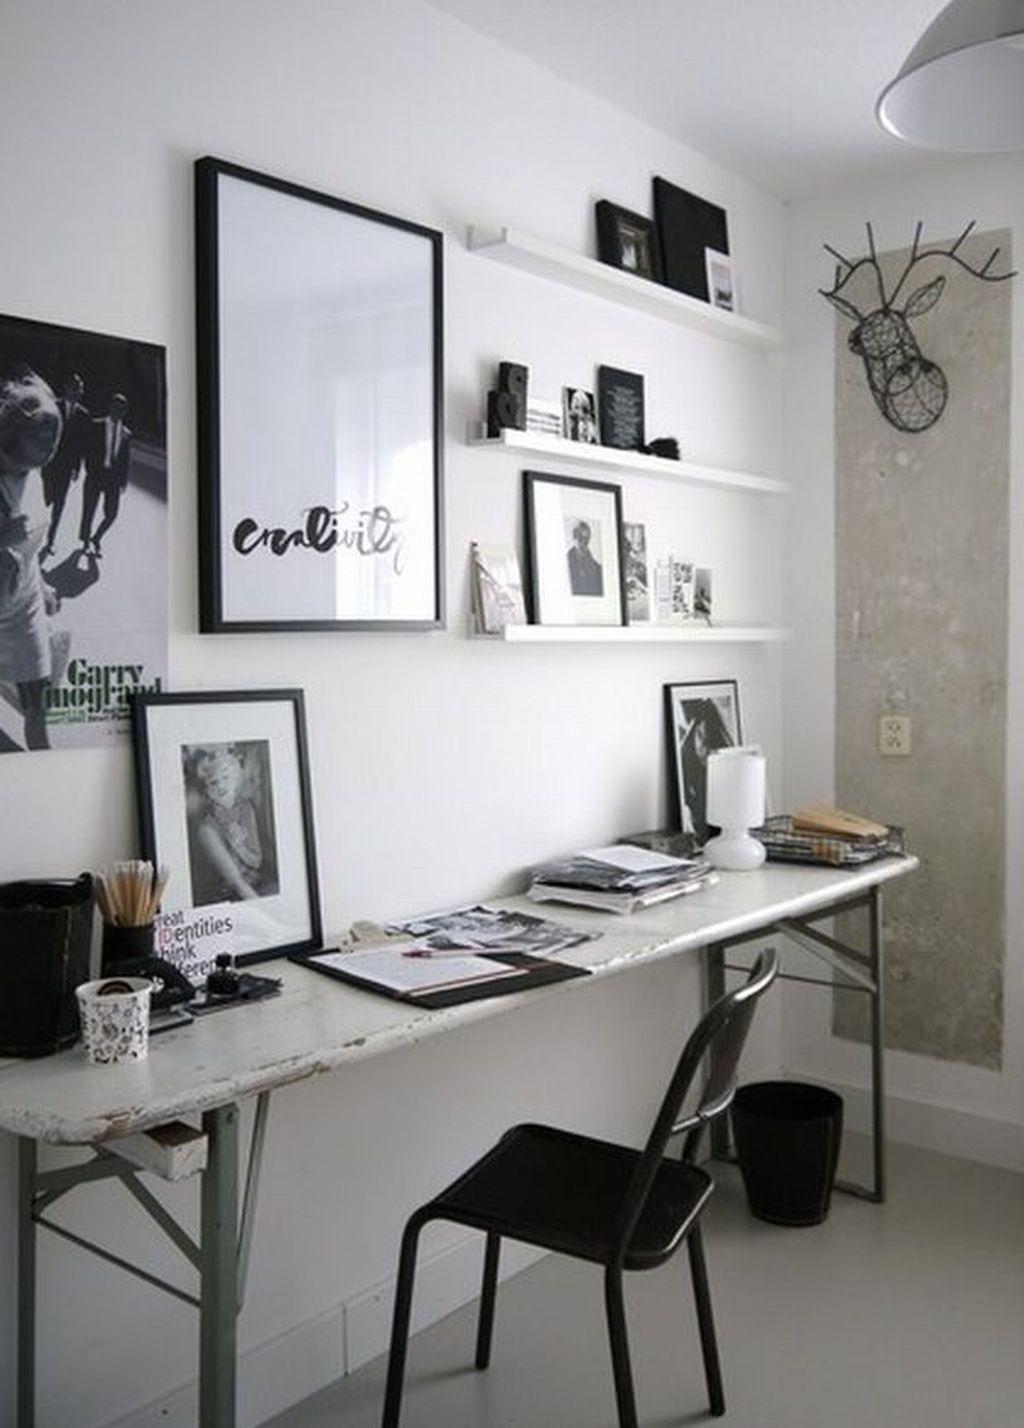 Splendid Deer Shelf Design Ideas With Minimalist Scandinavian Style To Try 33